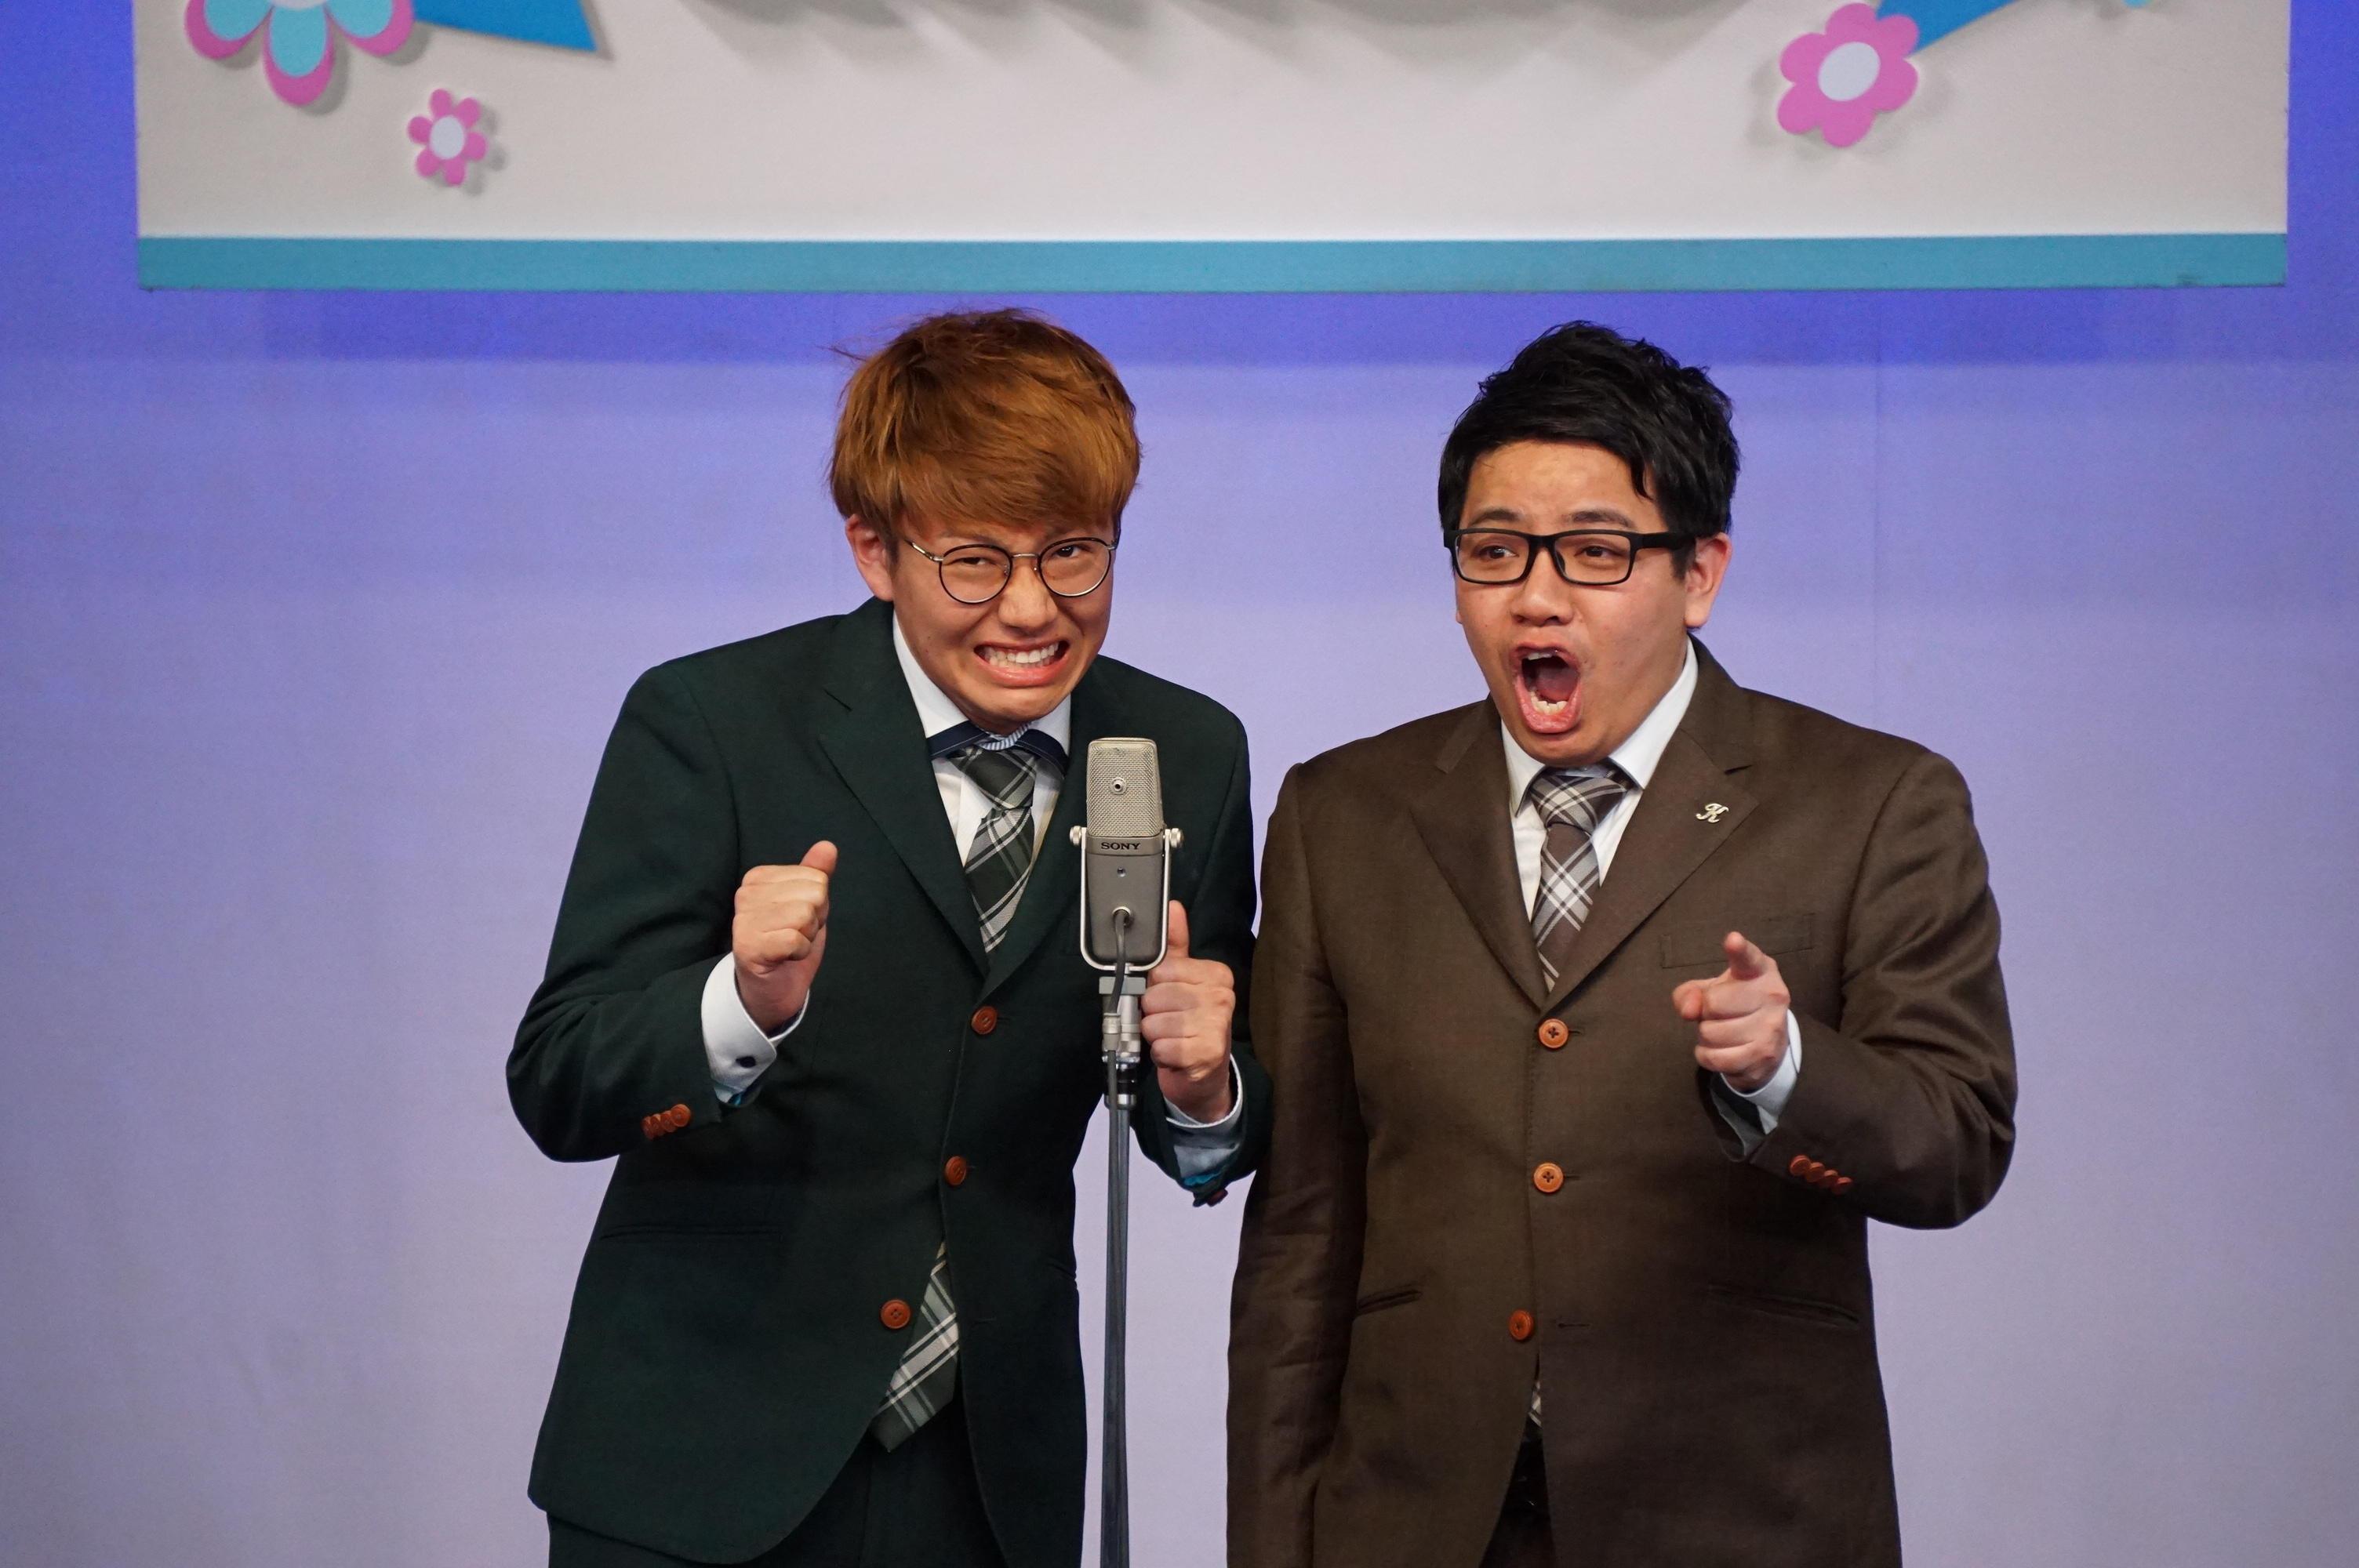 http://news.yoshimoto.co.jp/20170314201110-eeea771771e57508265b3bb6ccd9f148ca8aefb8.jpg